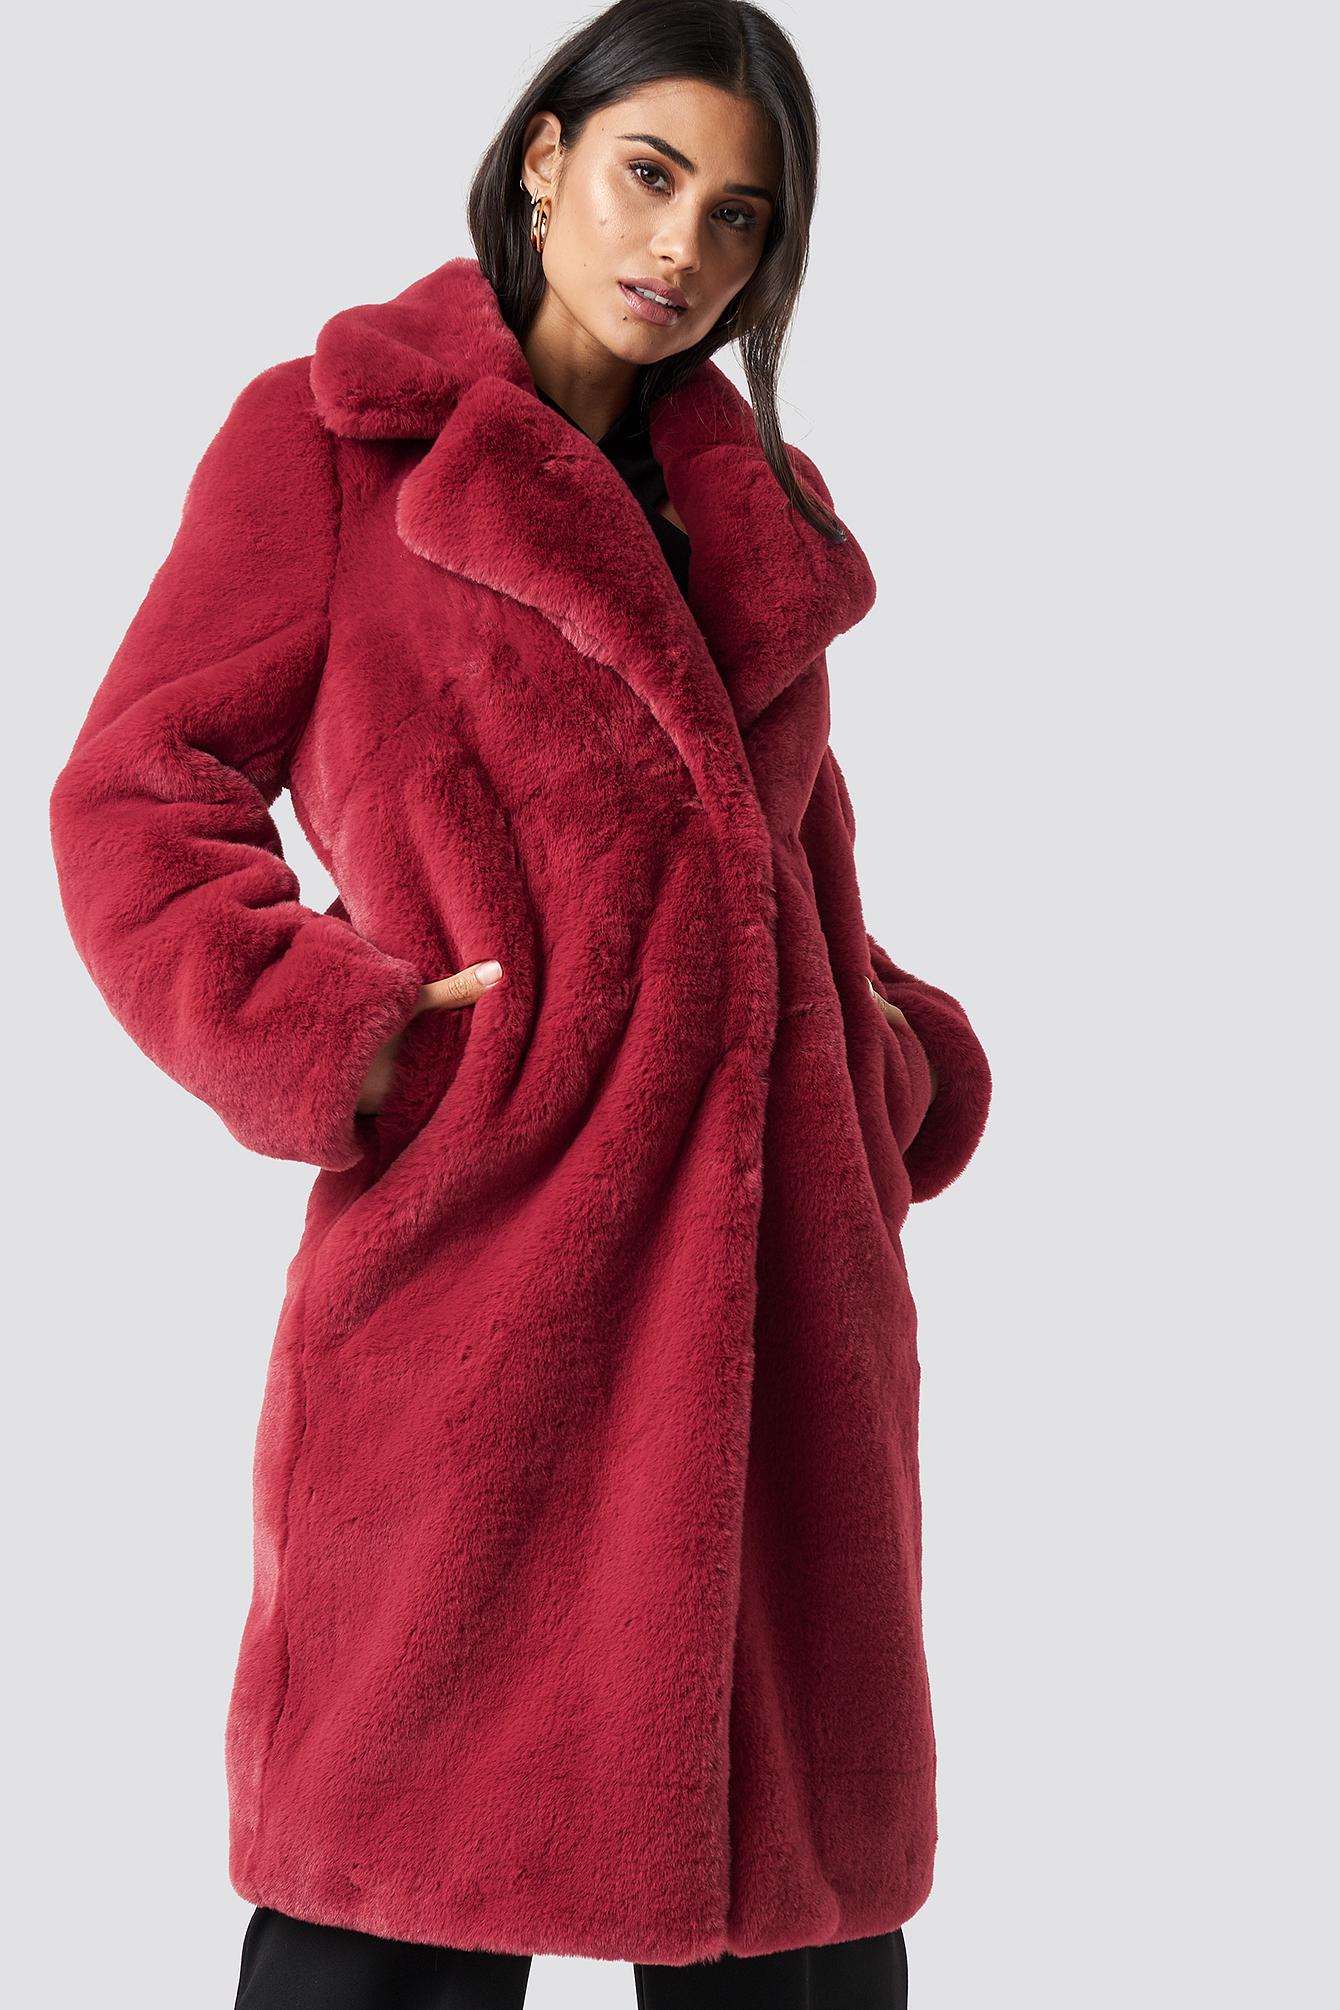 dilara x na-kd -  Faux Fur Maxi Coat - Red